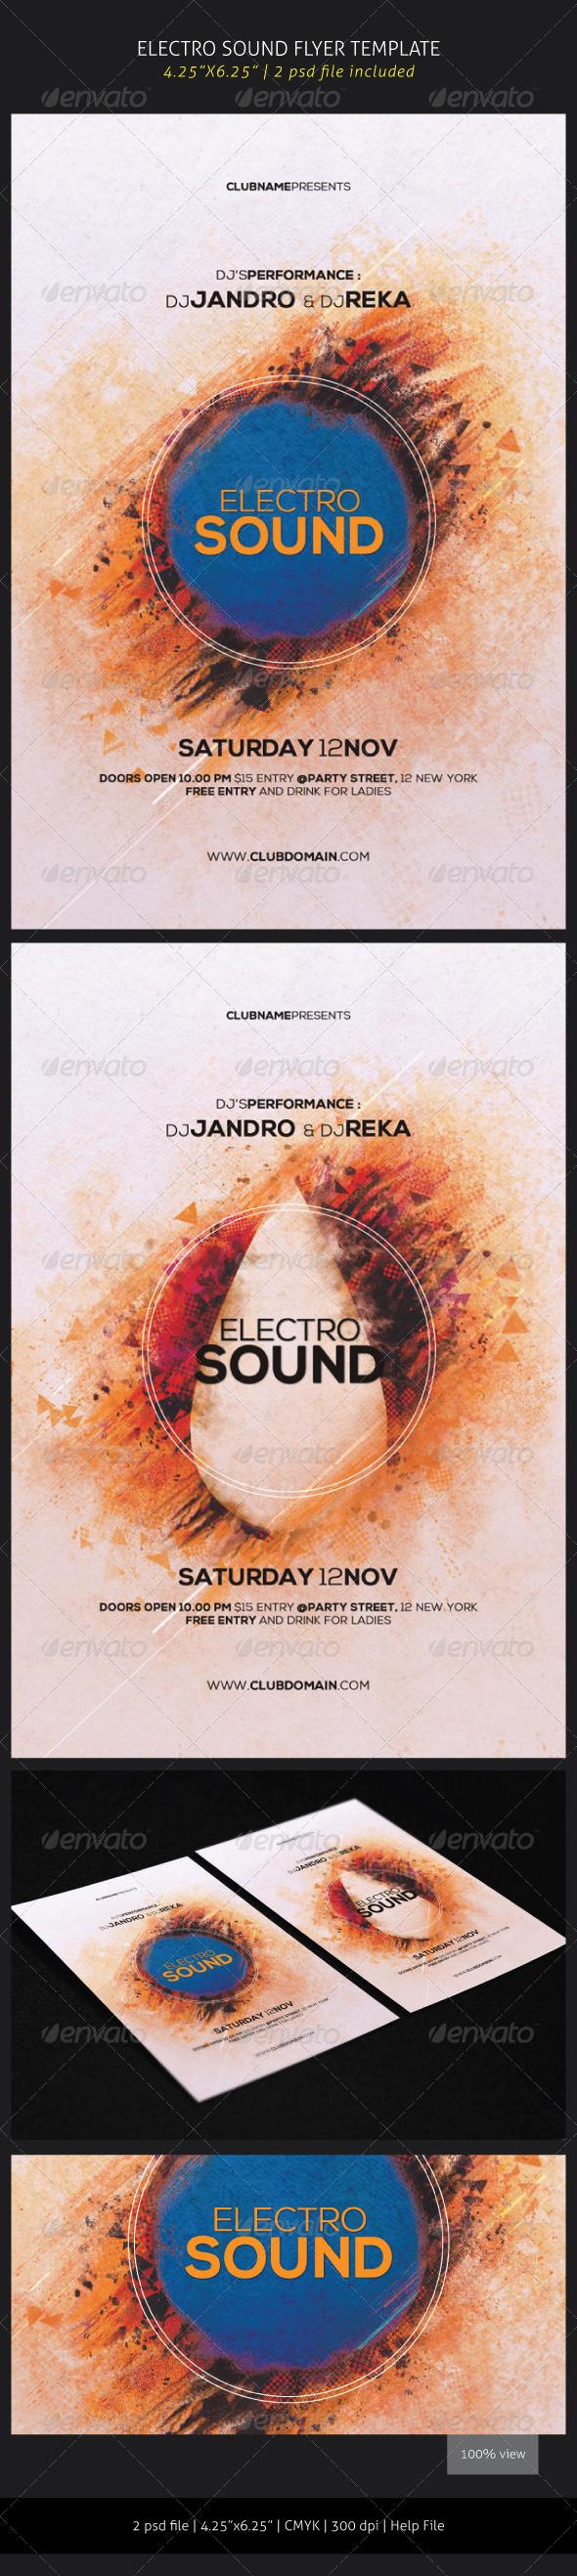 GraphicRiver Electro Sound Flyer 5889943